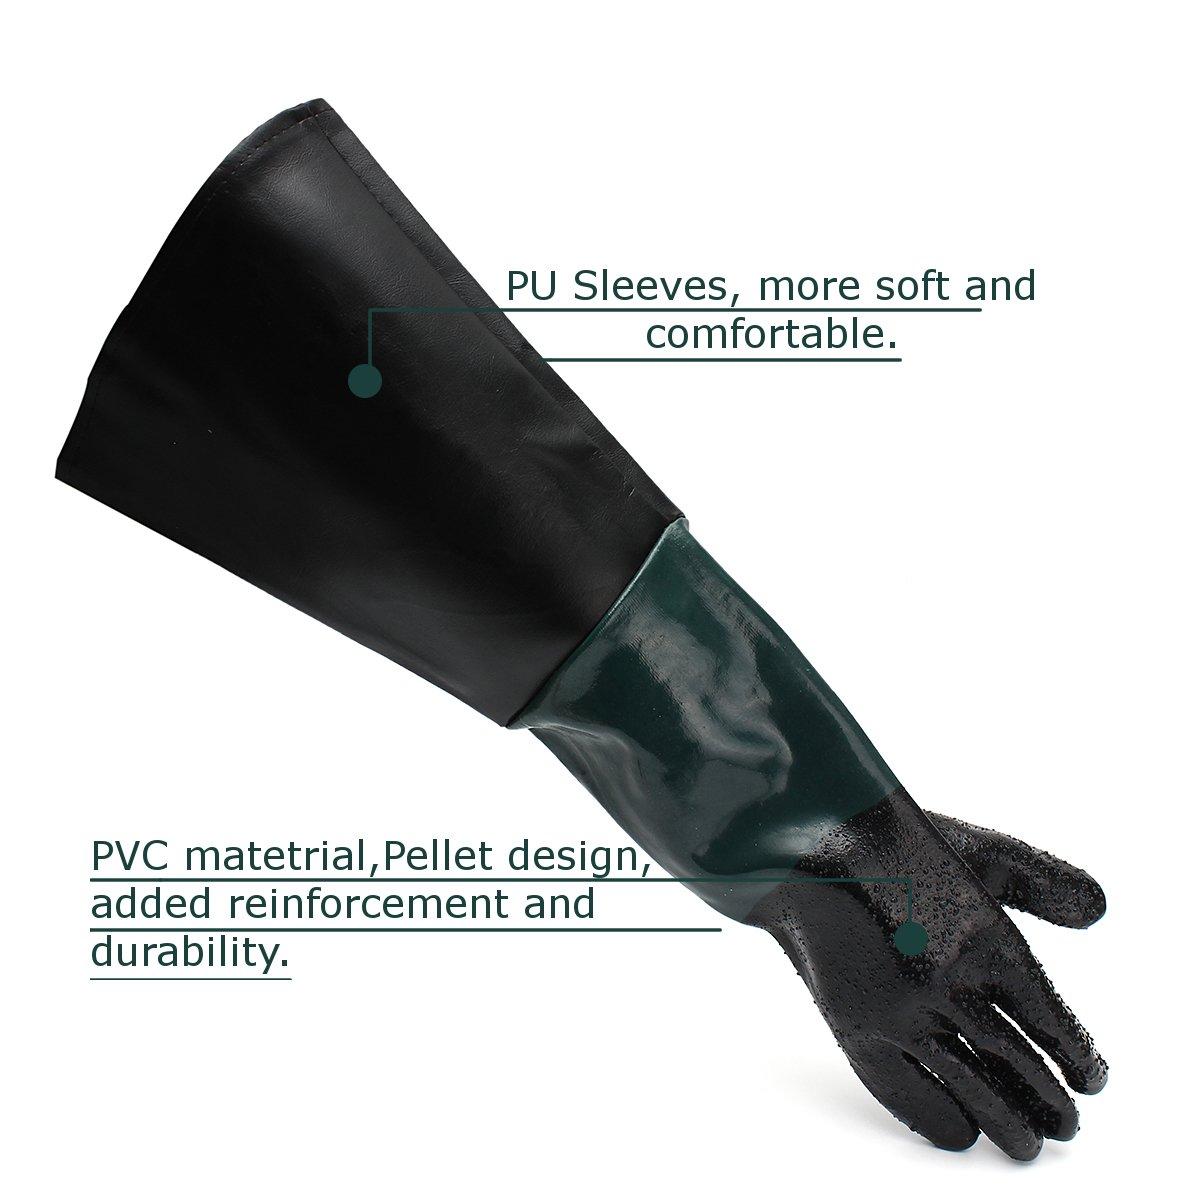 Jewboer 23 6 Quot Rubber Sandblasting Sandblaster Gloves For